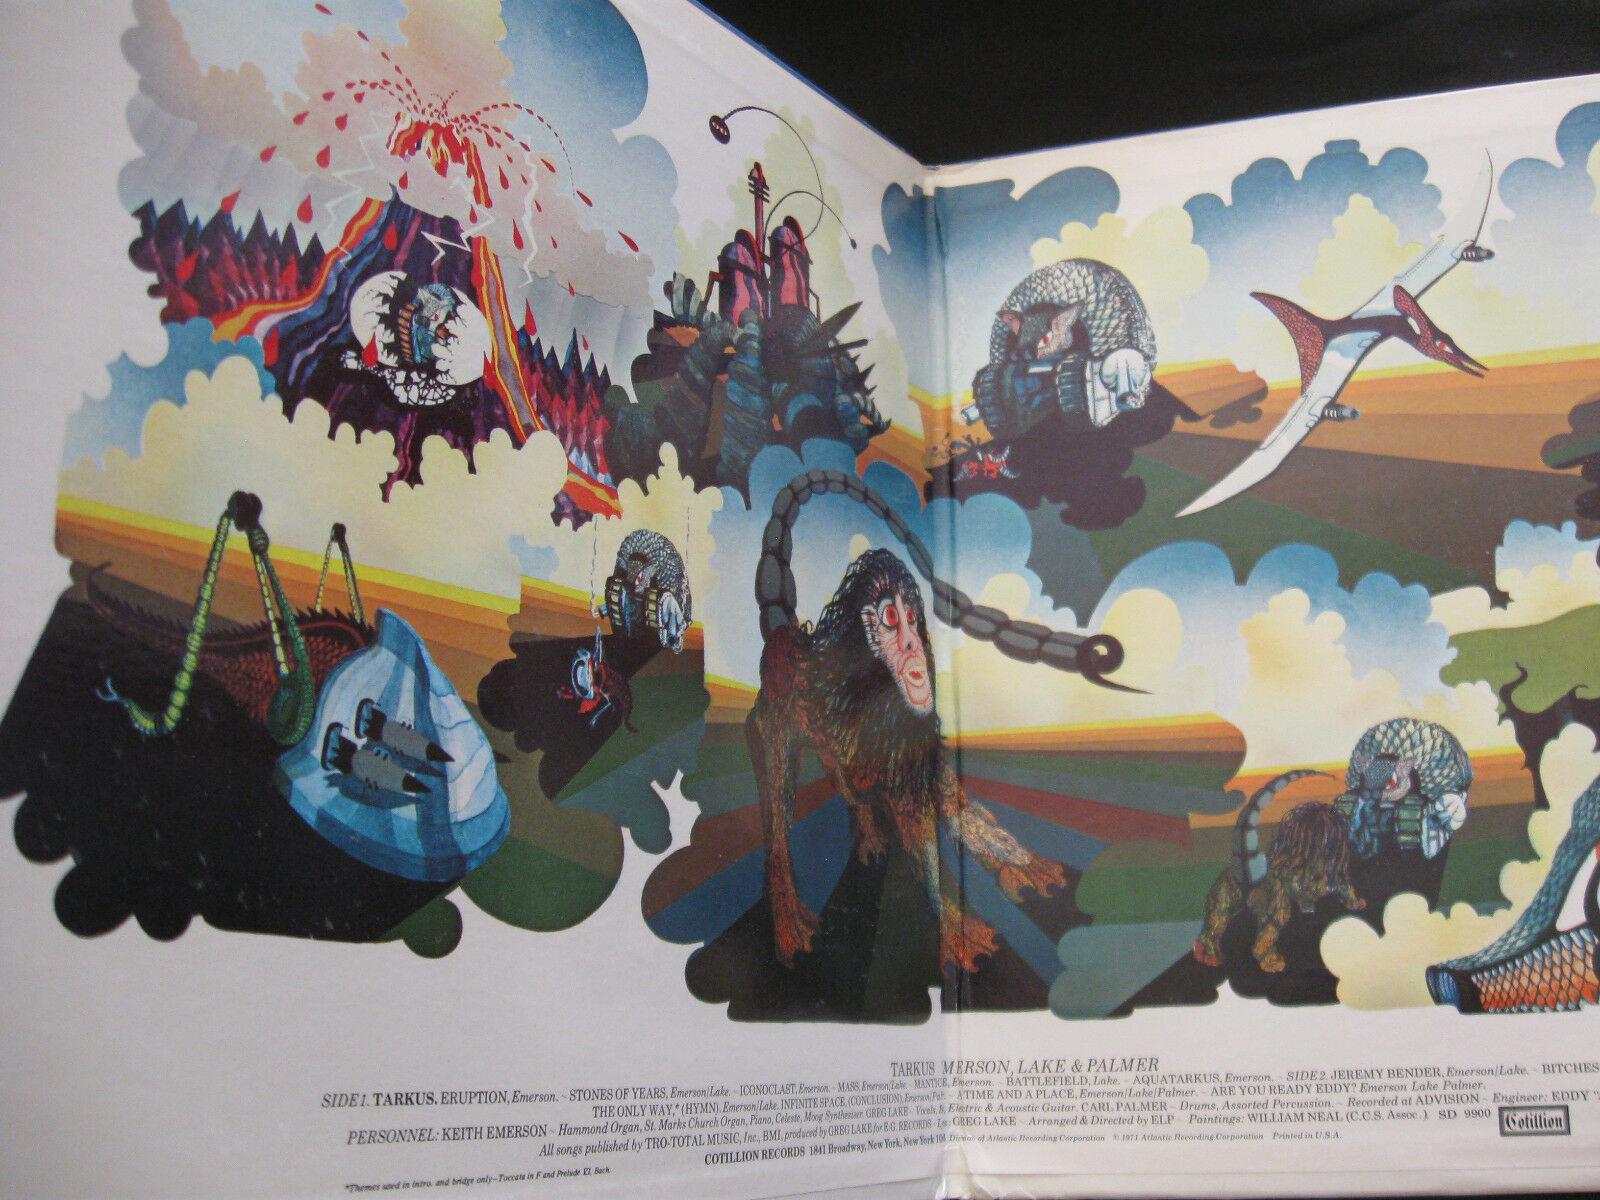 Emerson Lake & Palmer ELP Tarkus Cotillion SD 9900 Stereo Vinyl LP Record Album image 2